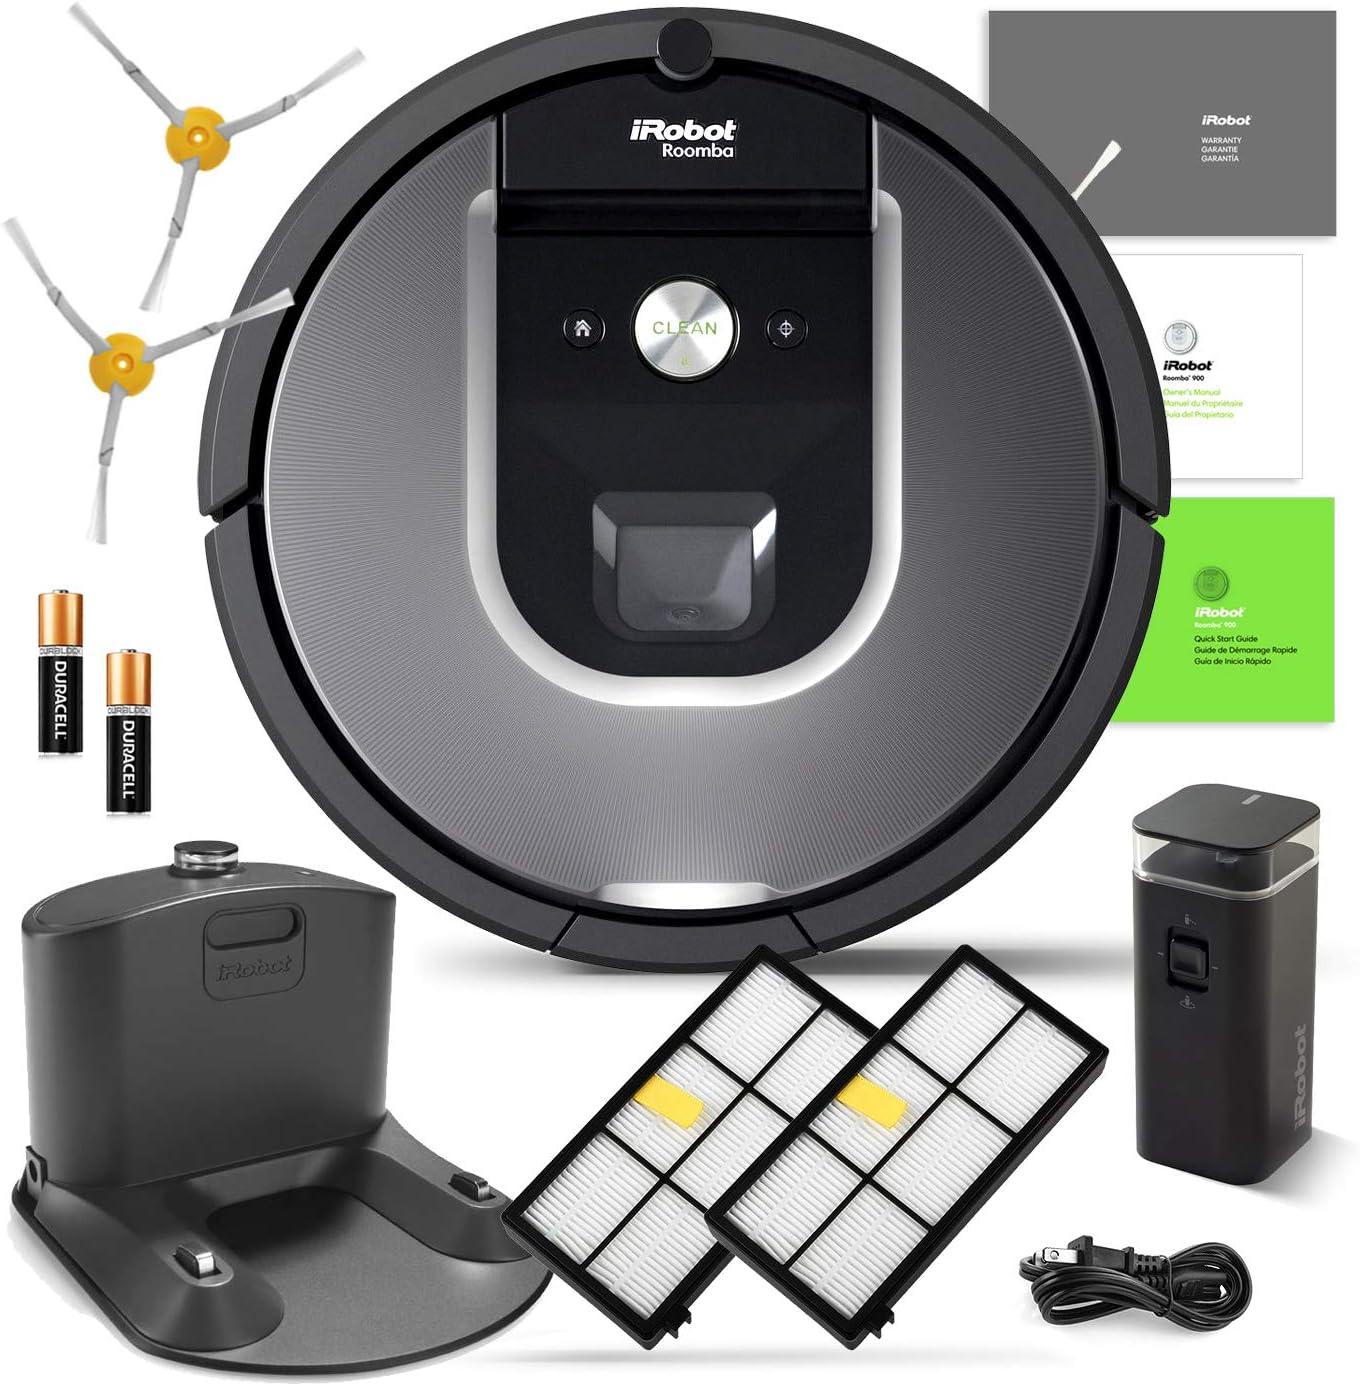 iRobot Roomba 960 vacío Robot de Limpieza: Amazon.es: Hogar